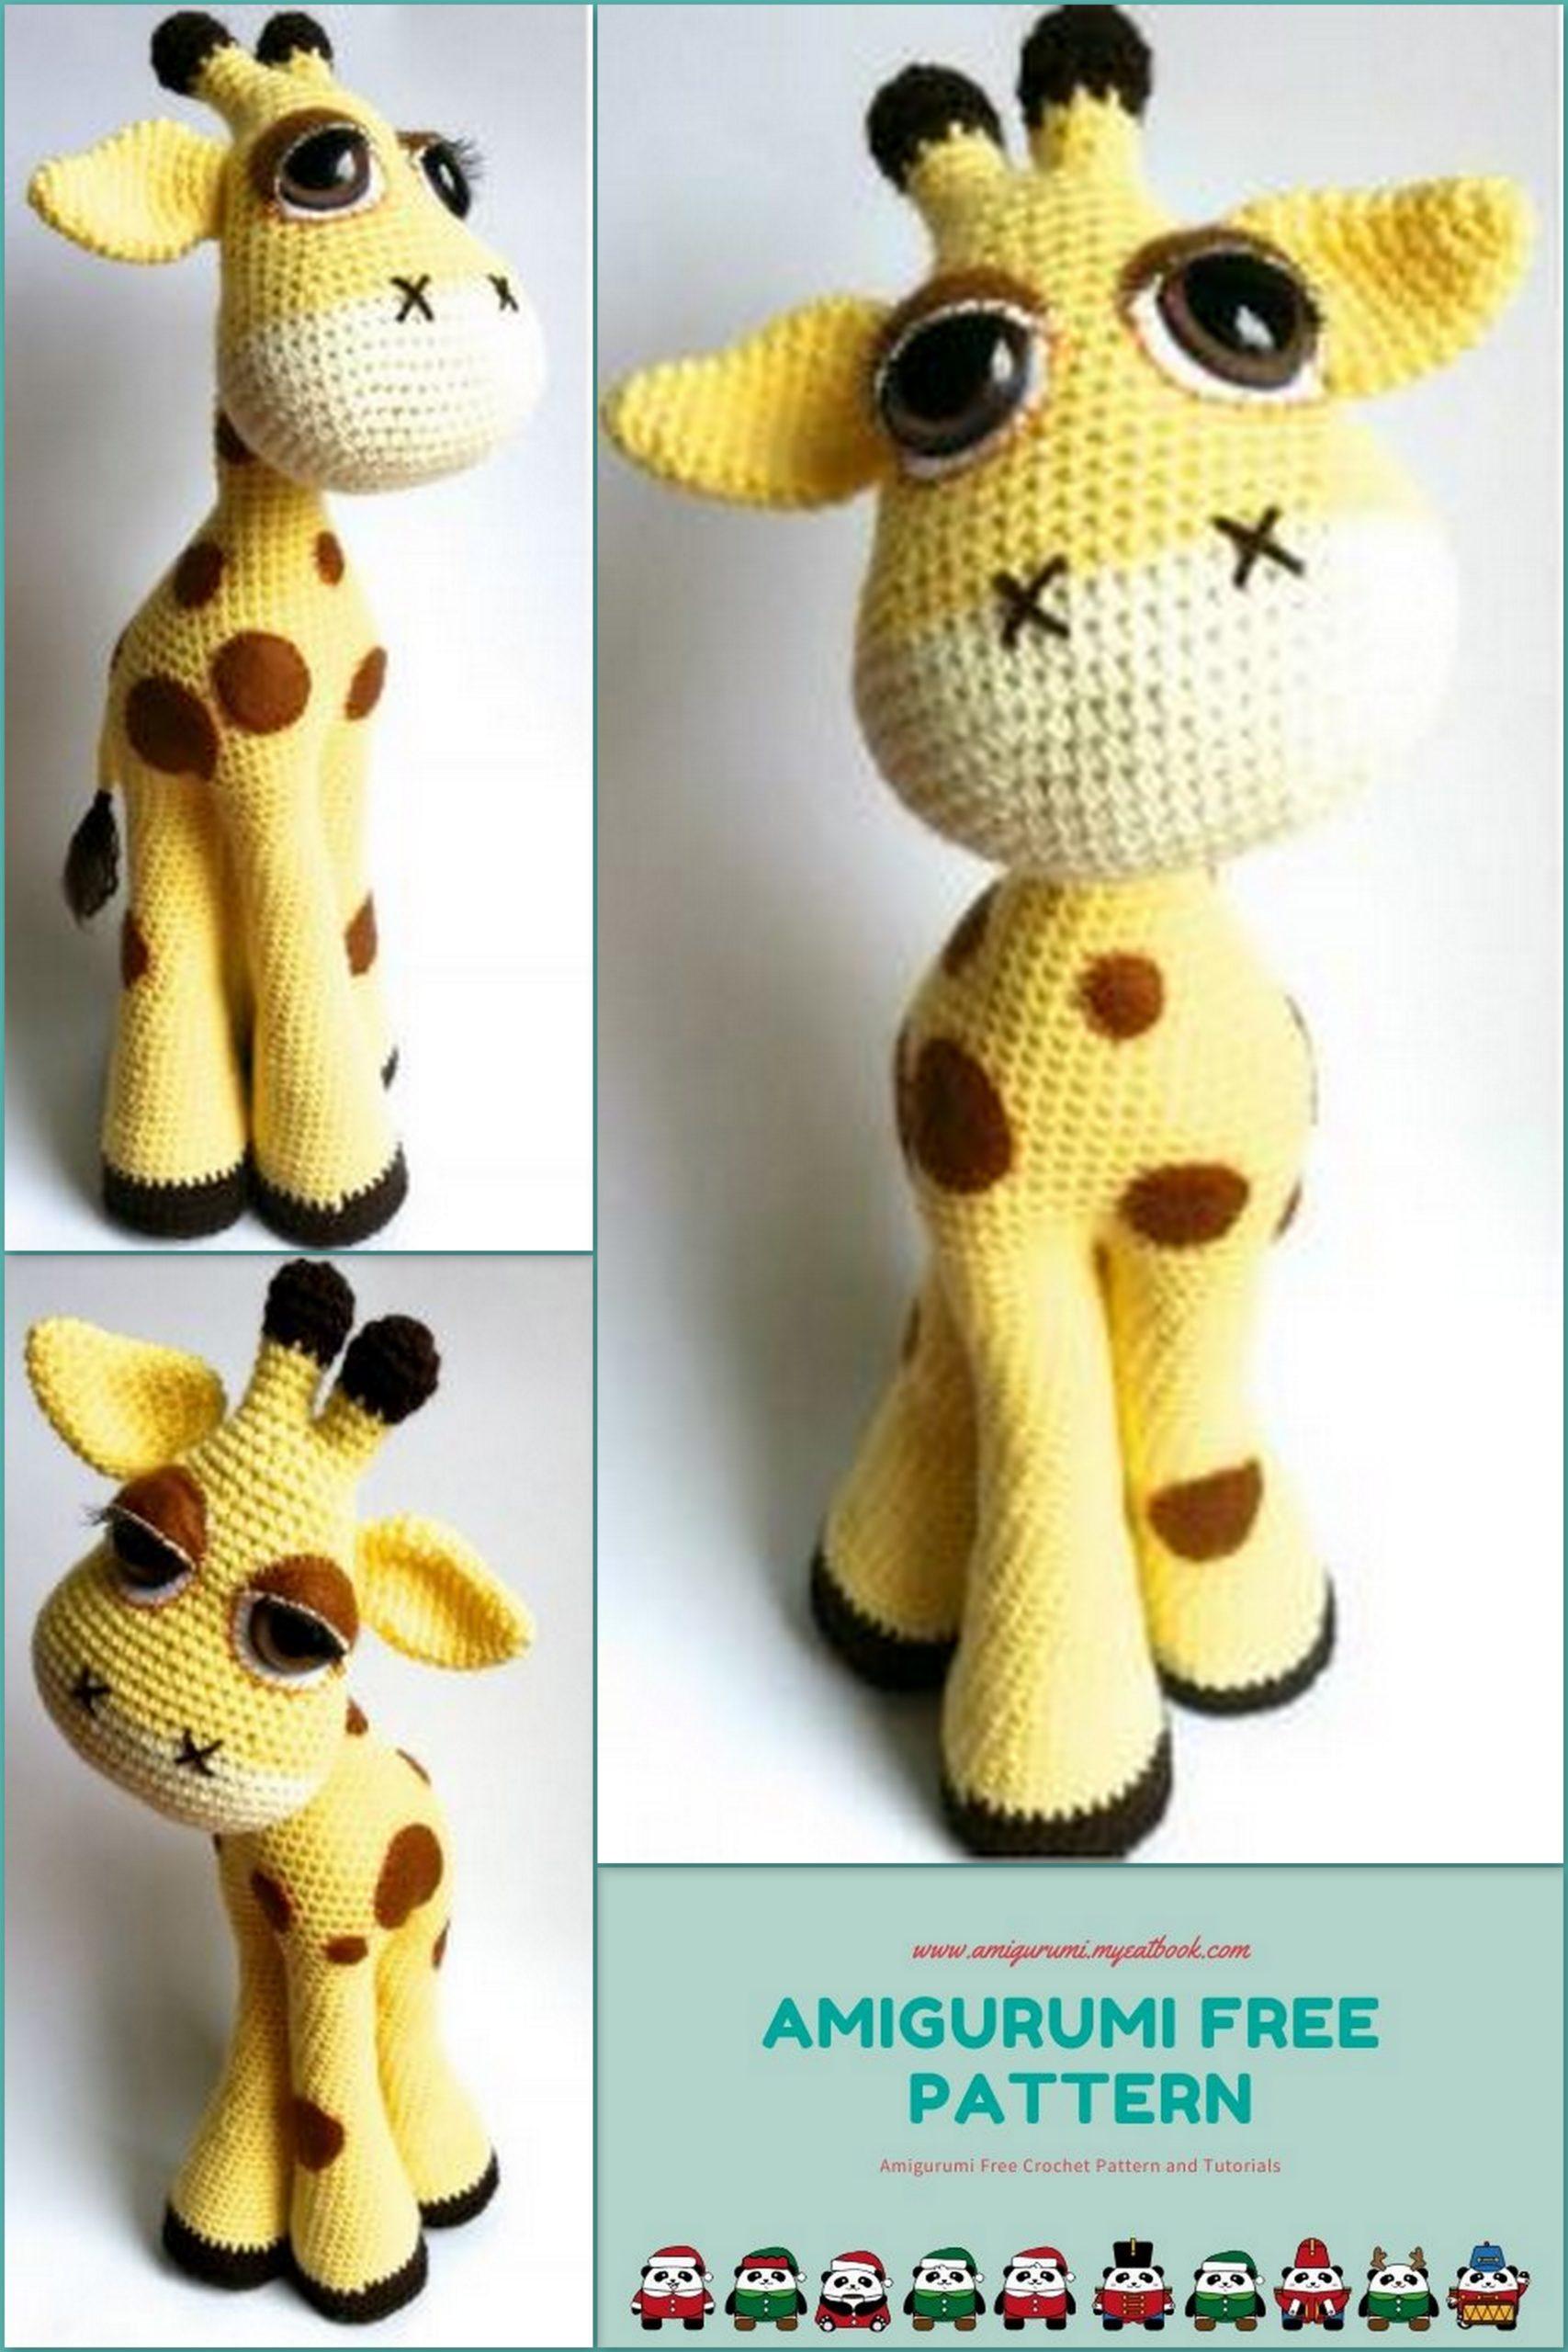 Giraffe Crochet Patterns -Amigurumi Tips - A More Crafty Life | 2560x1707